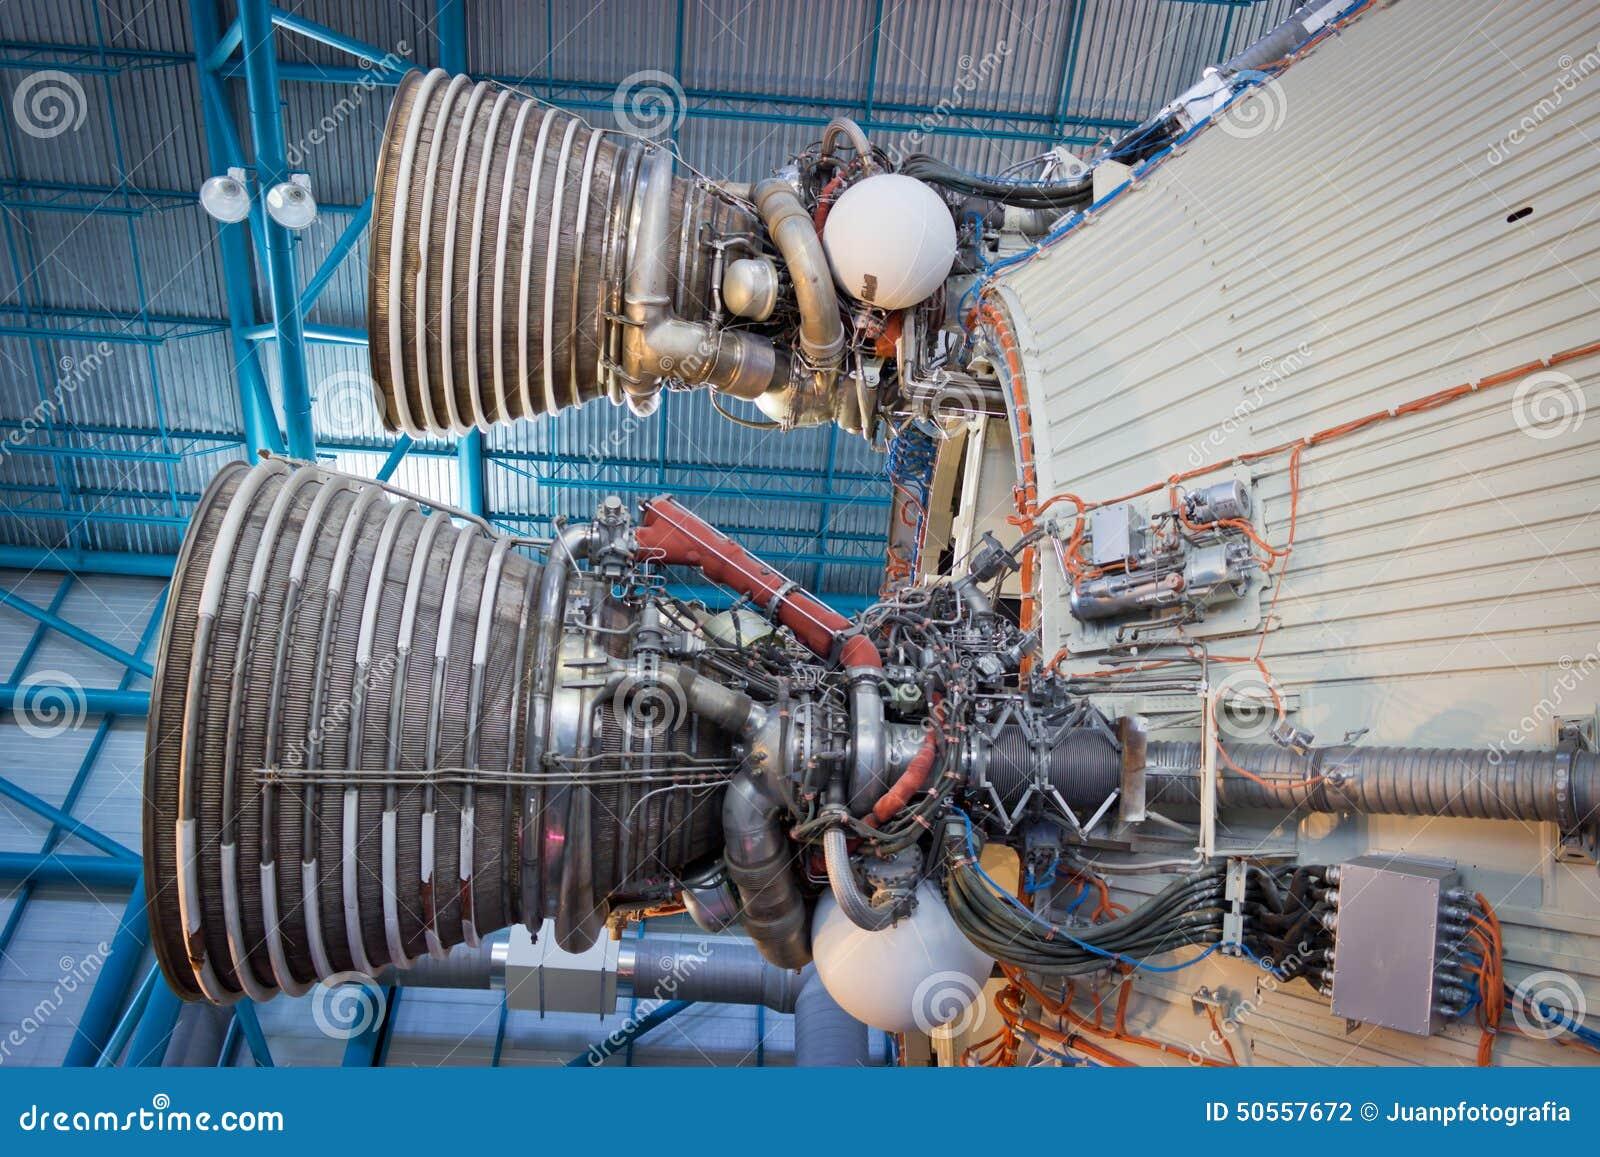 kennedy space center apollo exhibit - photo #12